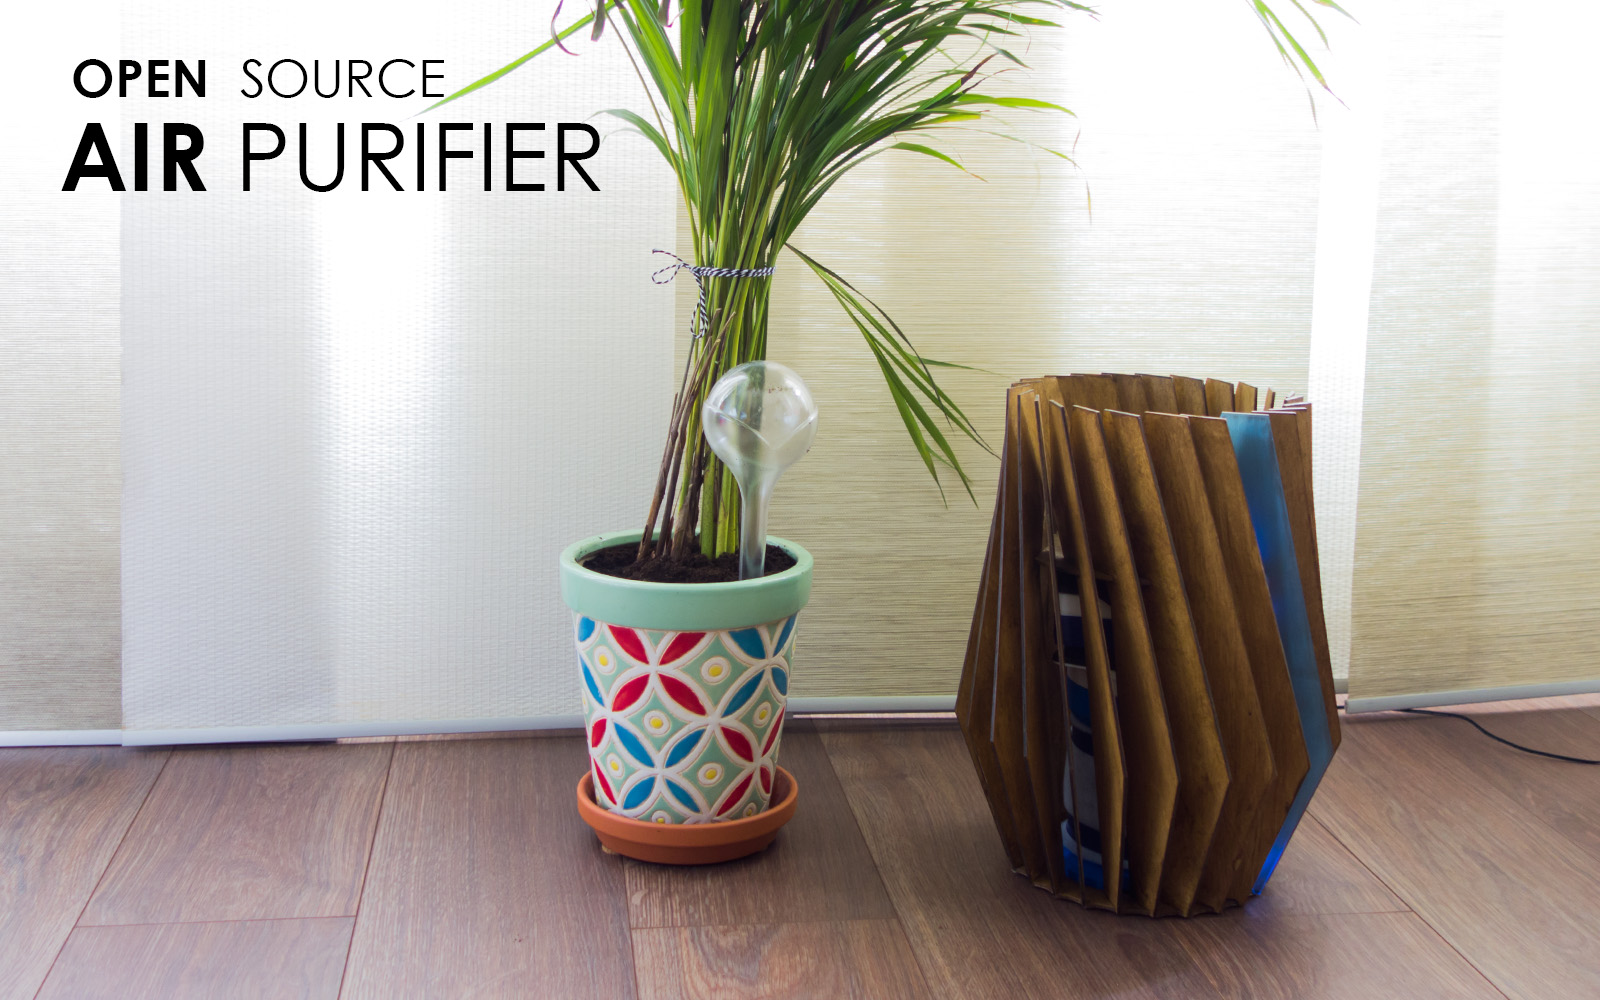 OPEN SOURCE AIR PURIFIER - Ian van Mourik 1